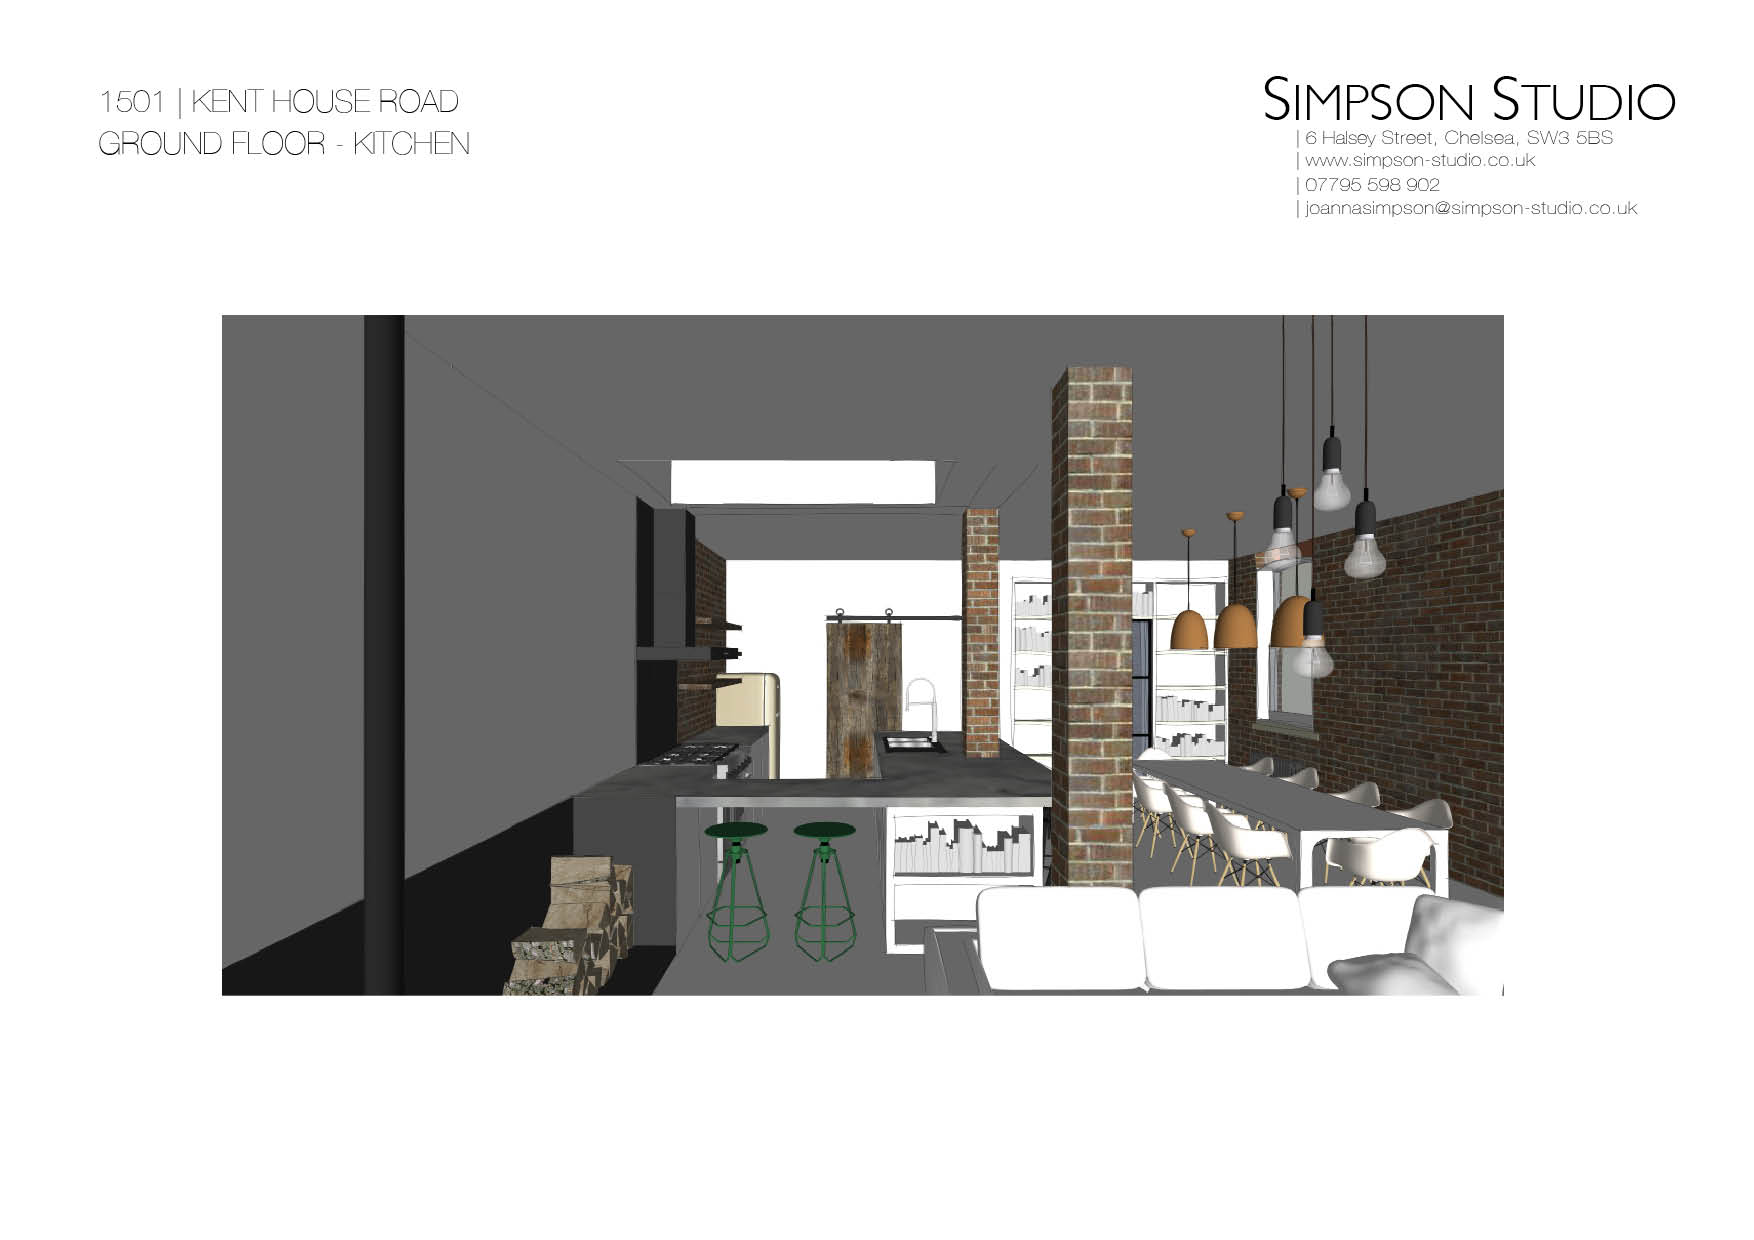 Kent House Road Room Planning8.jpg